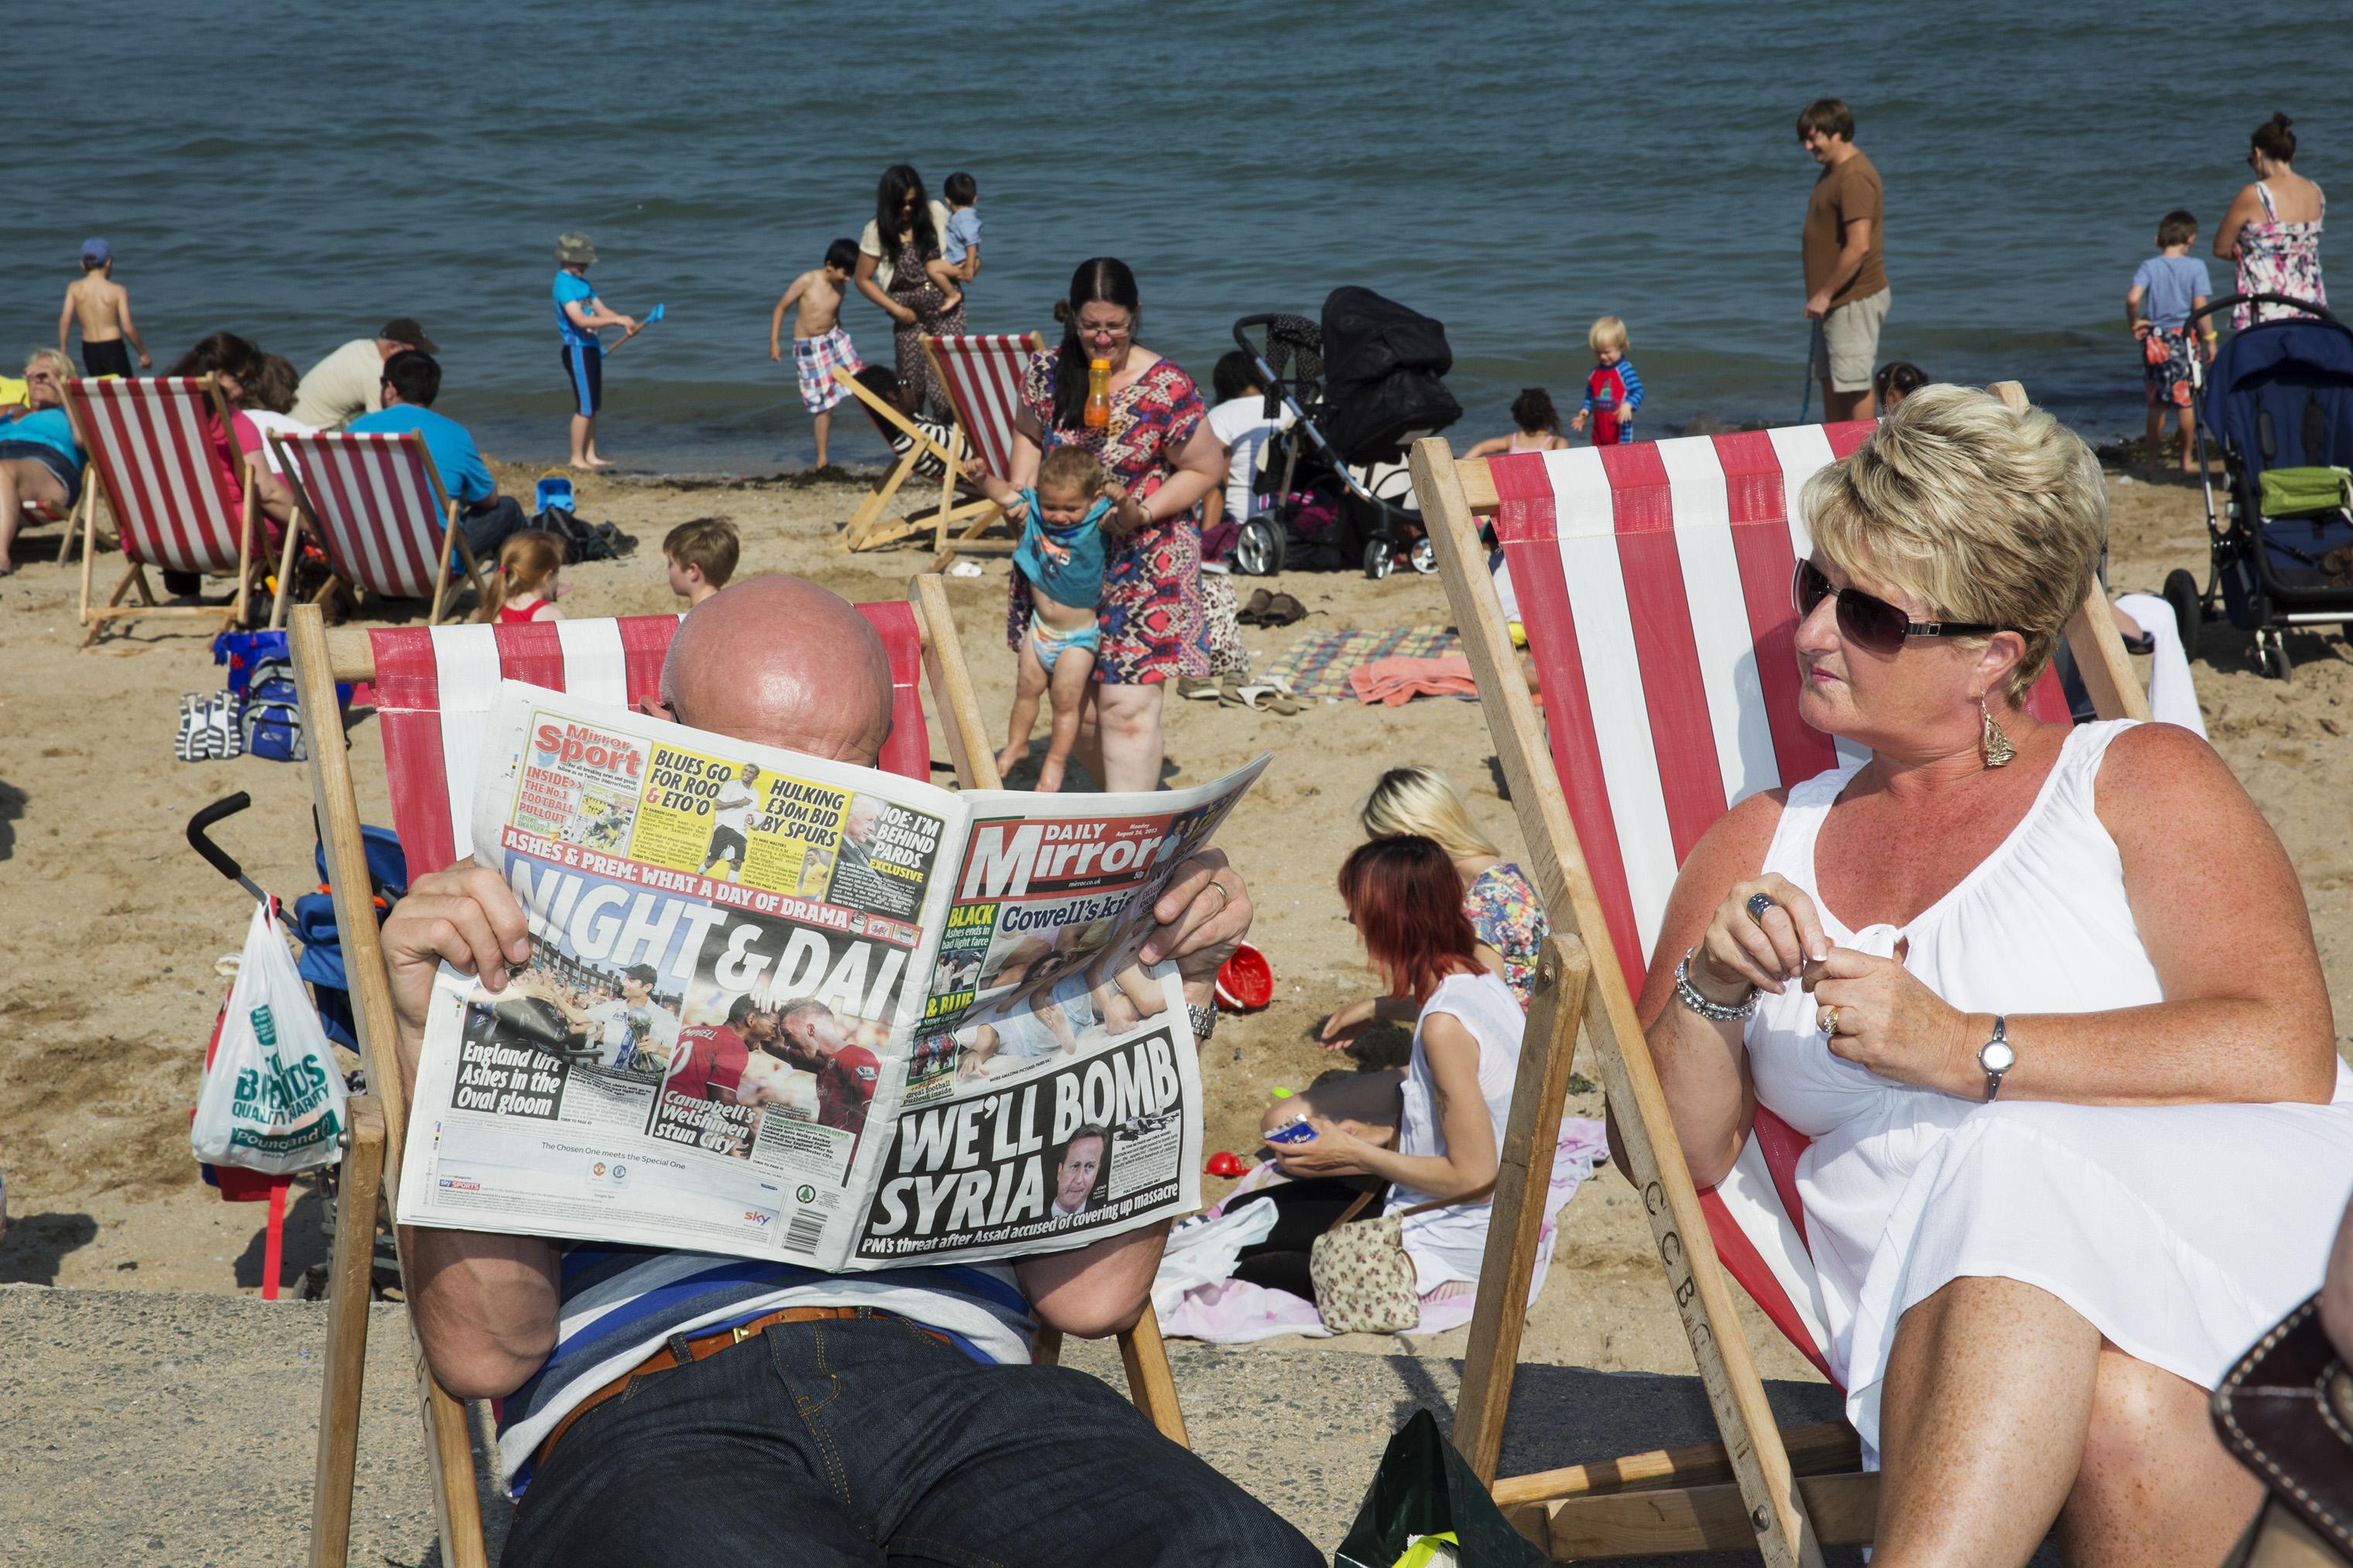 A beach scene on a Bank Holiday in Llandudno, Wales, 2013.